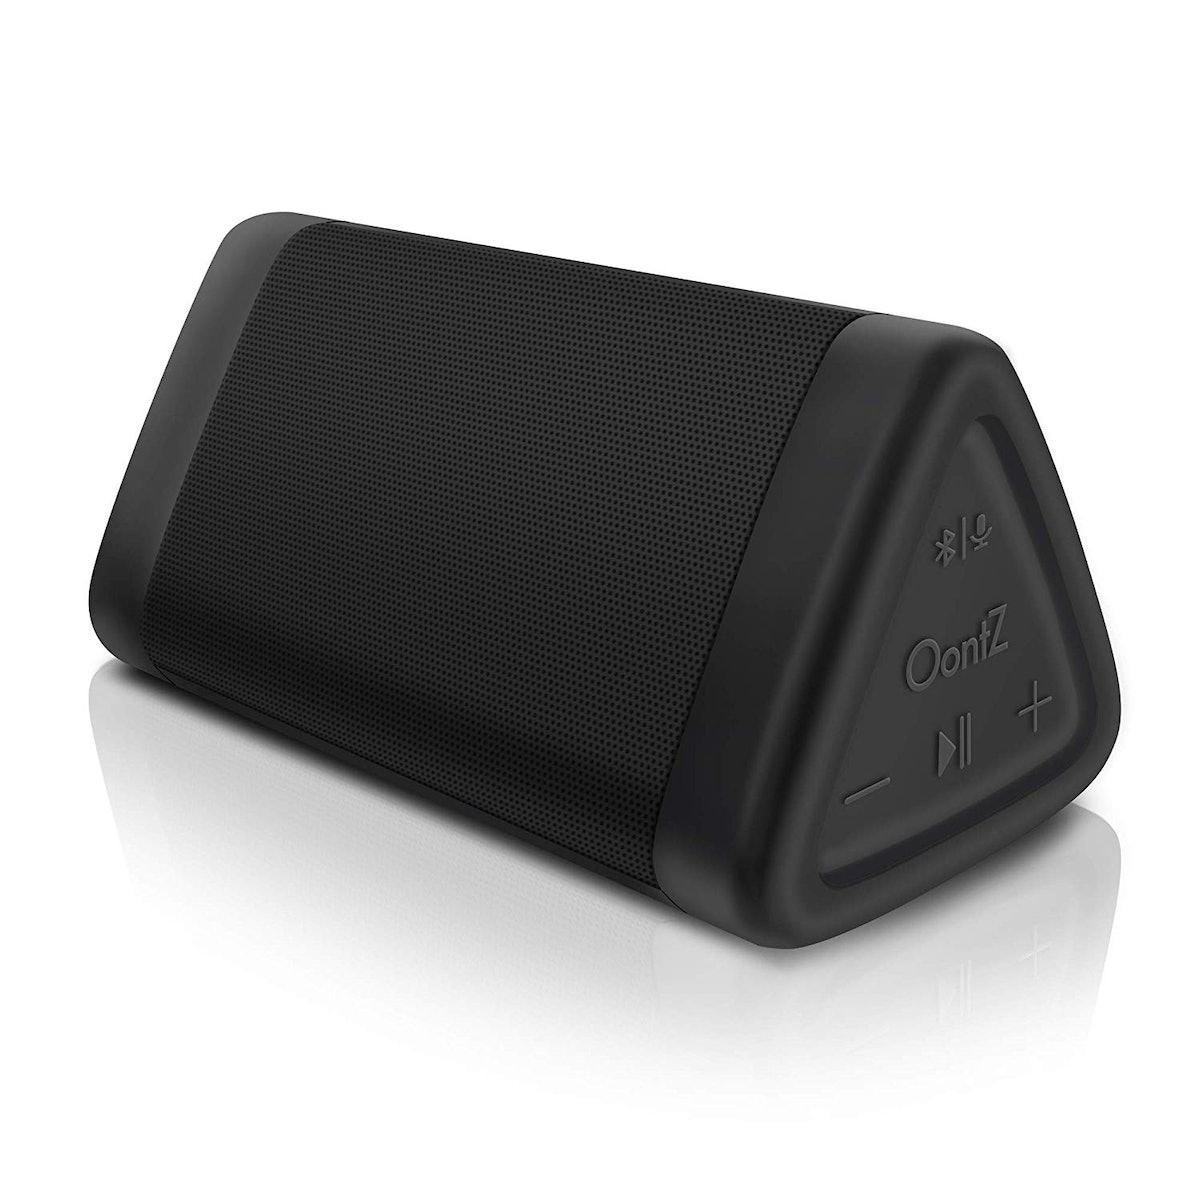 OontZ Angle 3 (3rd Gen) - Bluetooth Portable Speaker